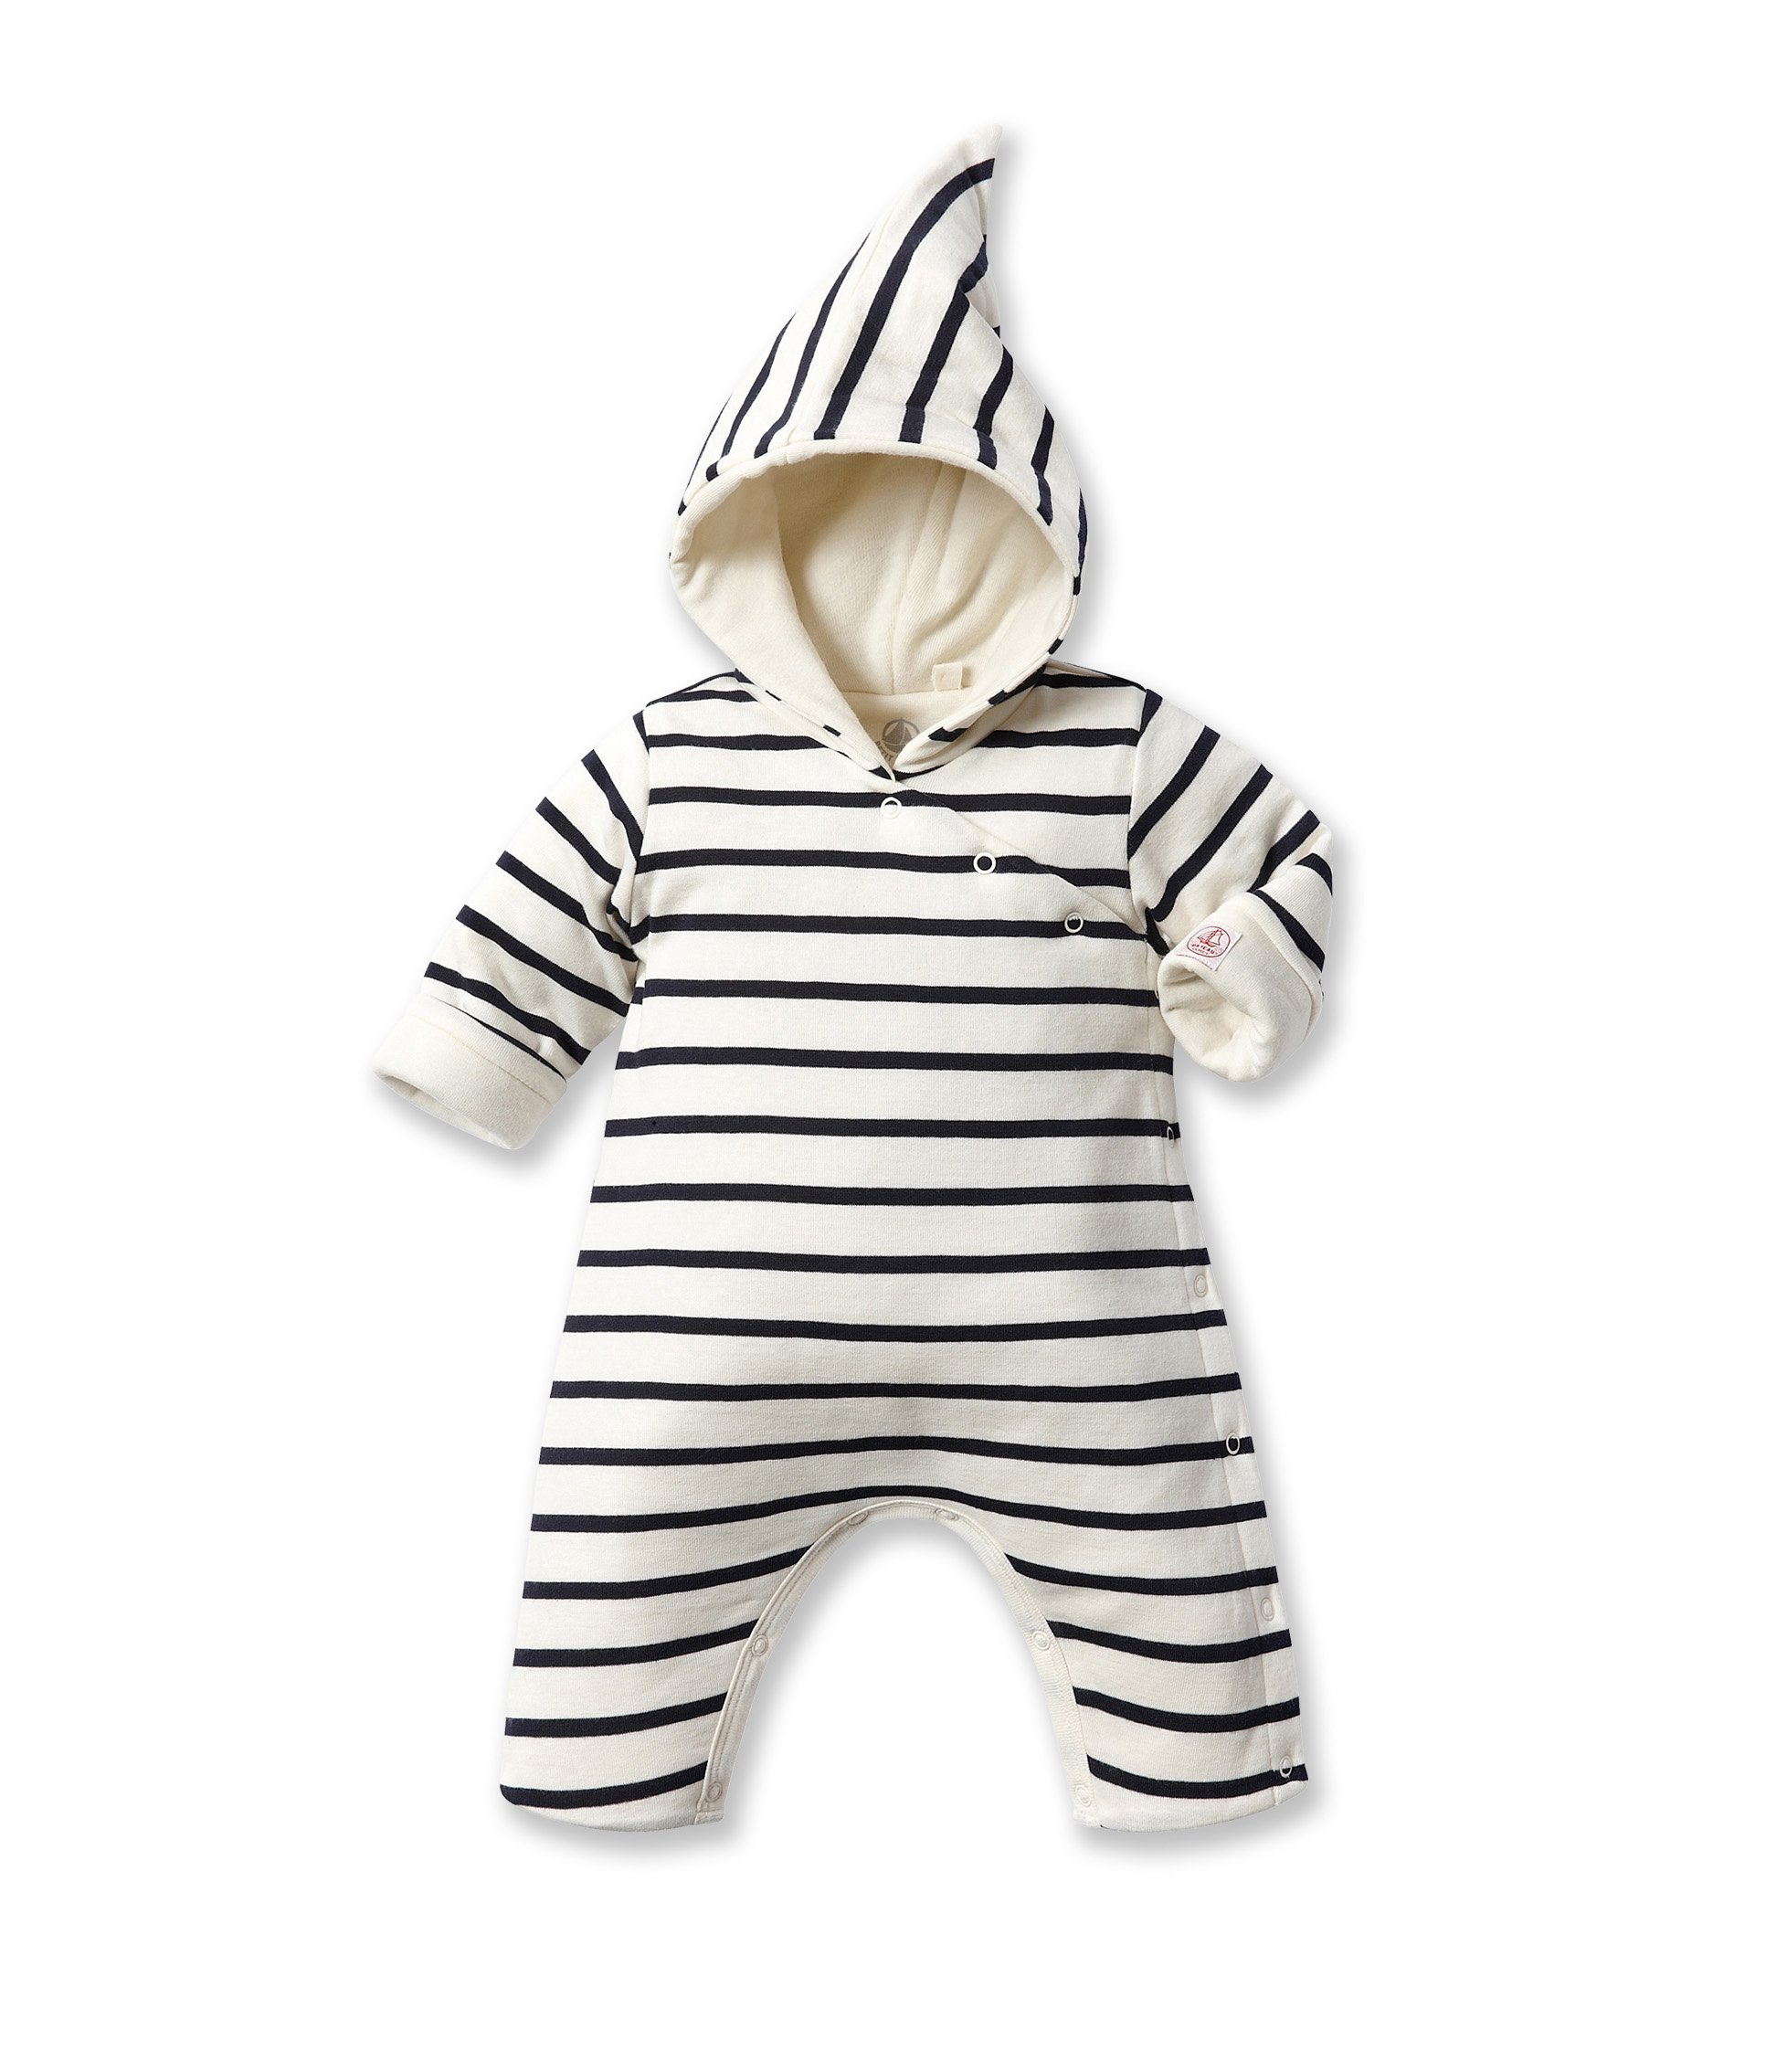 Petit Bateau Baby-Boys Newborn Hooded Striped Romper, Navy/White, 3 Months by Petit Bateau (Image #1)